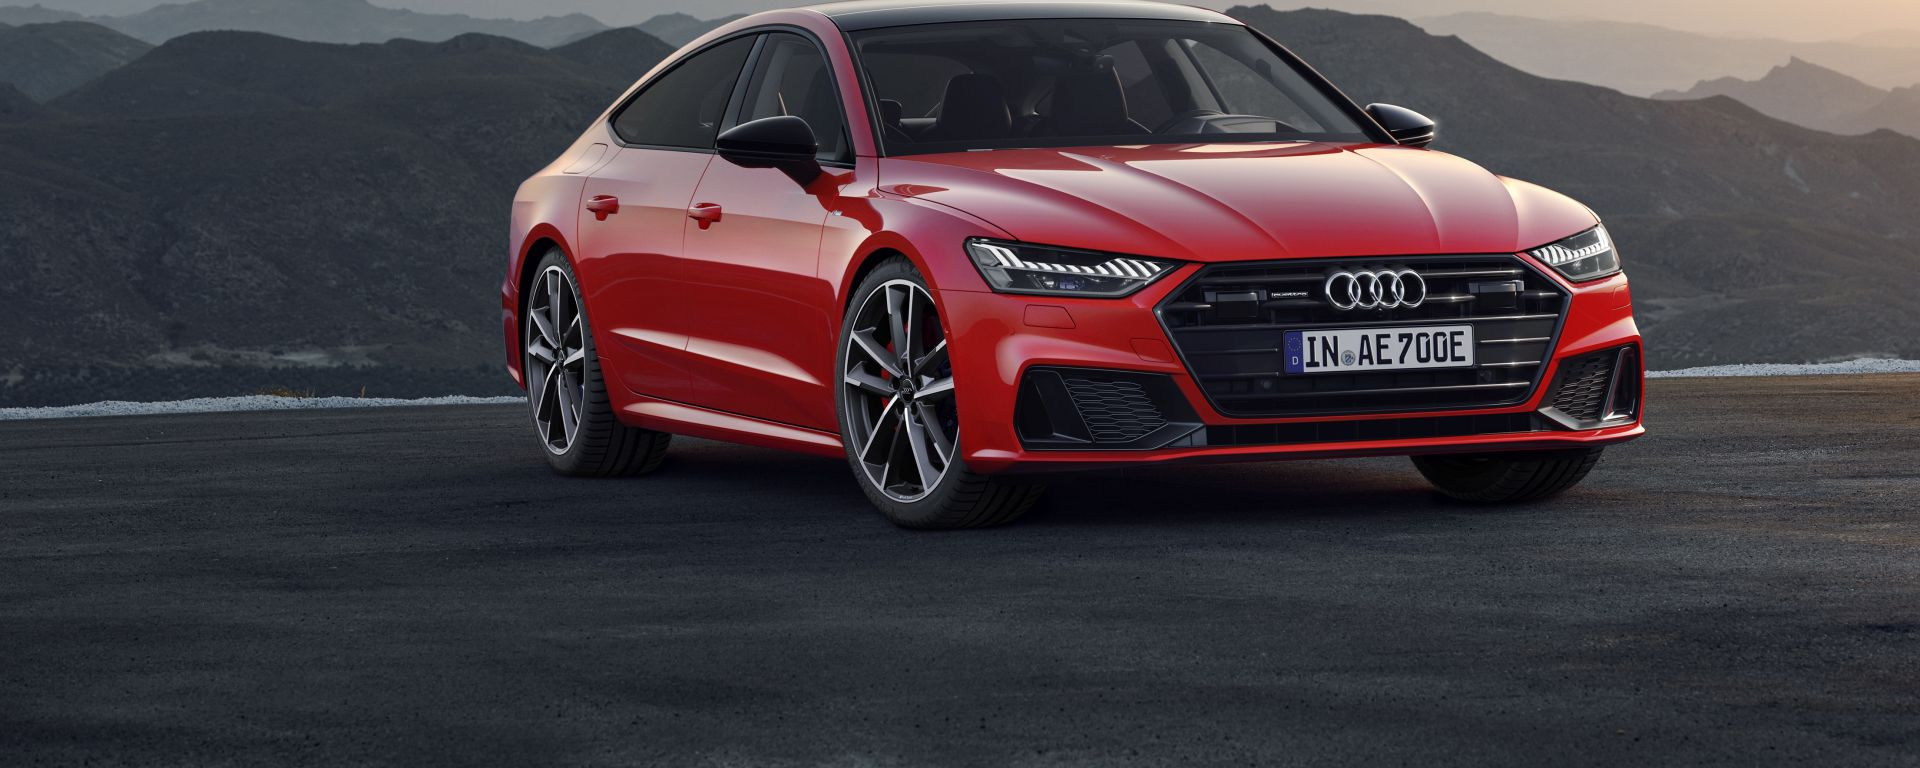 Nuova Audi A7 Sportback plug-in hybrid